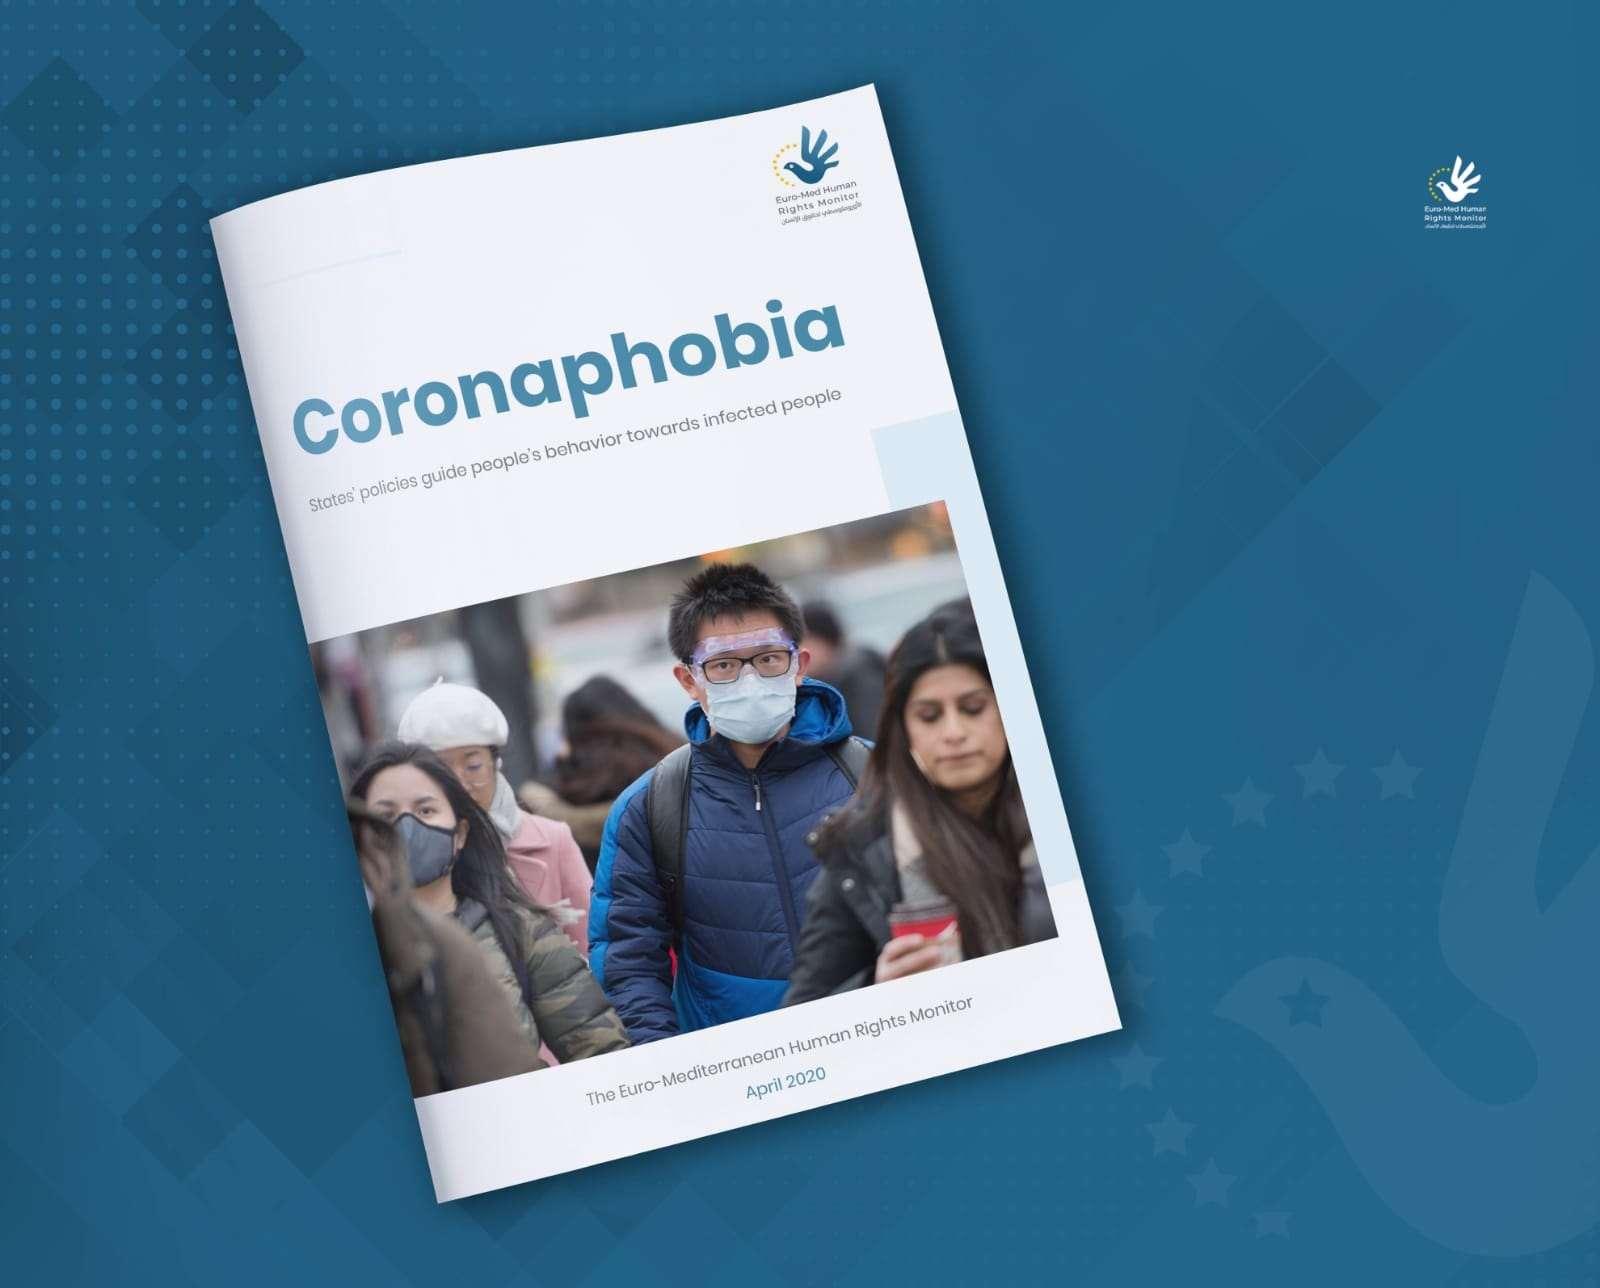 Report: Xenophobic bullying rages during coronavirus pandemic